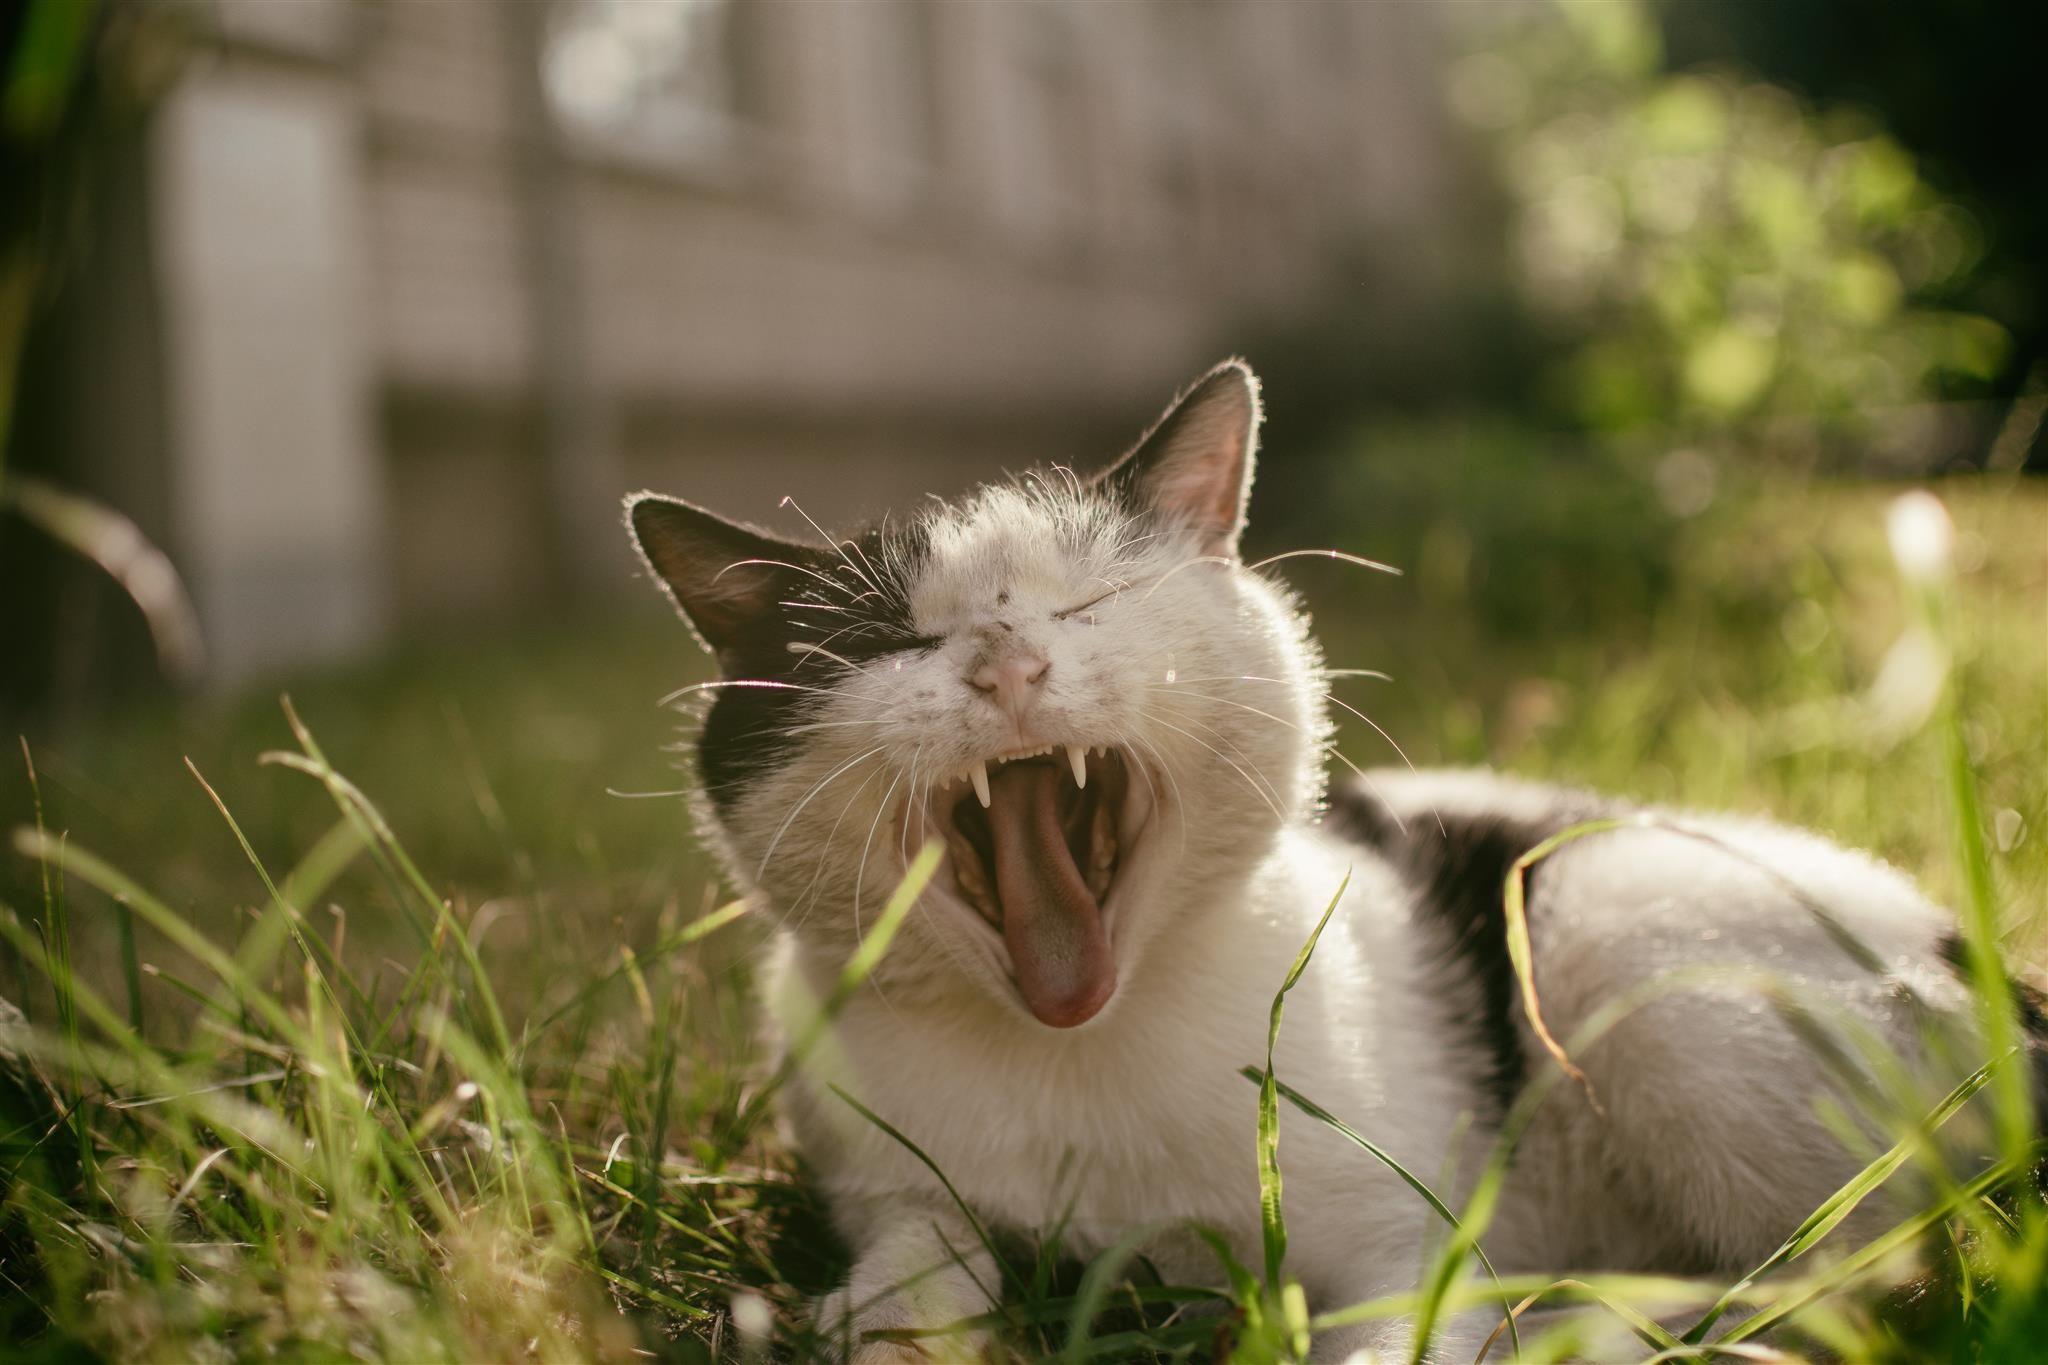 Soft kitty, warm kitty little ball of fur Happy kitty